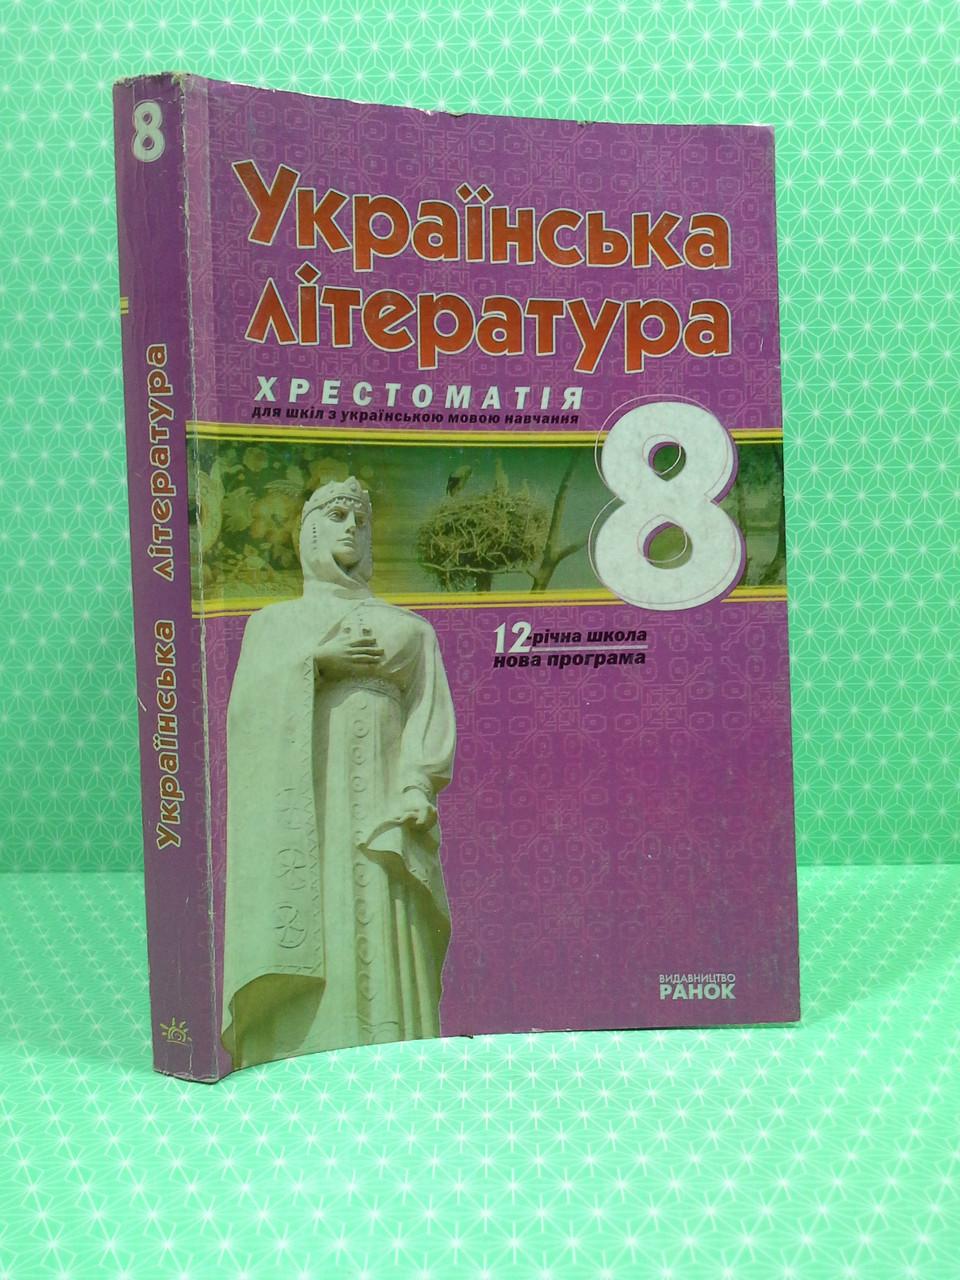 008 кл Укр література Паращич Хрестоматія Ранок